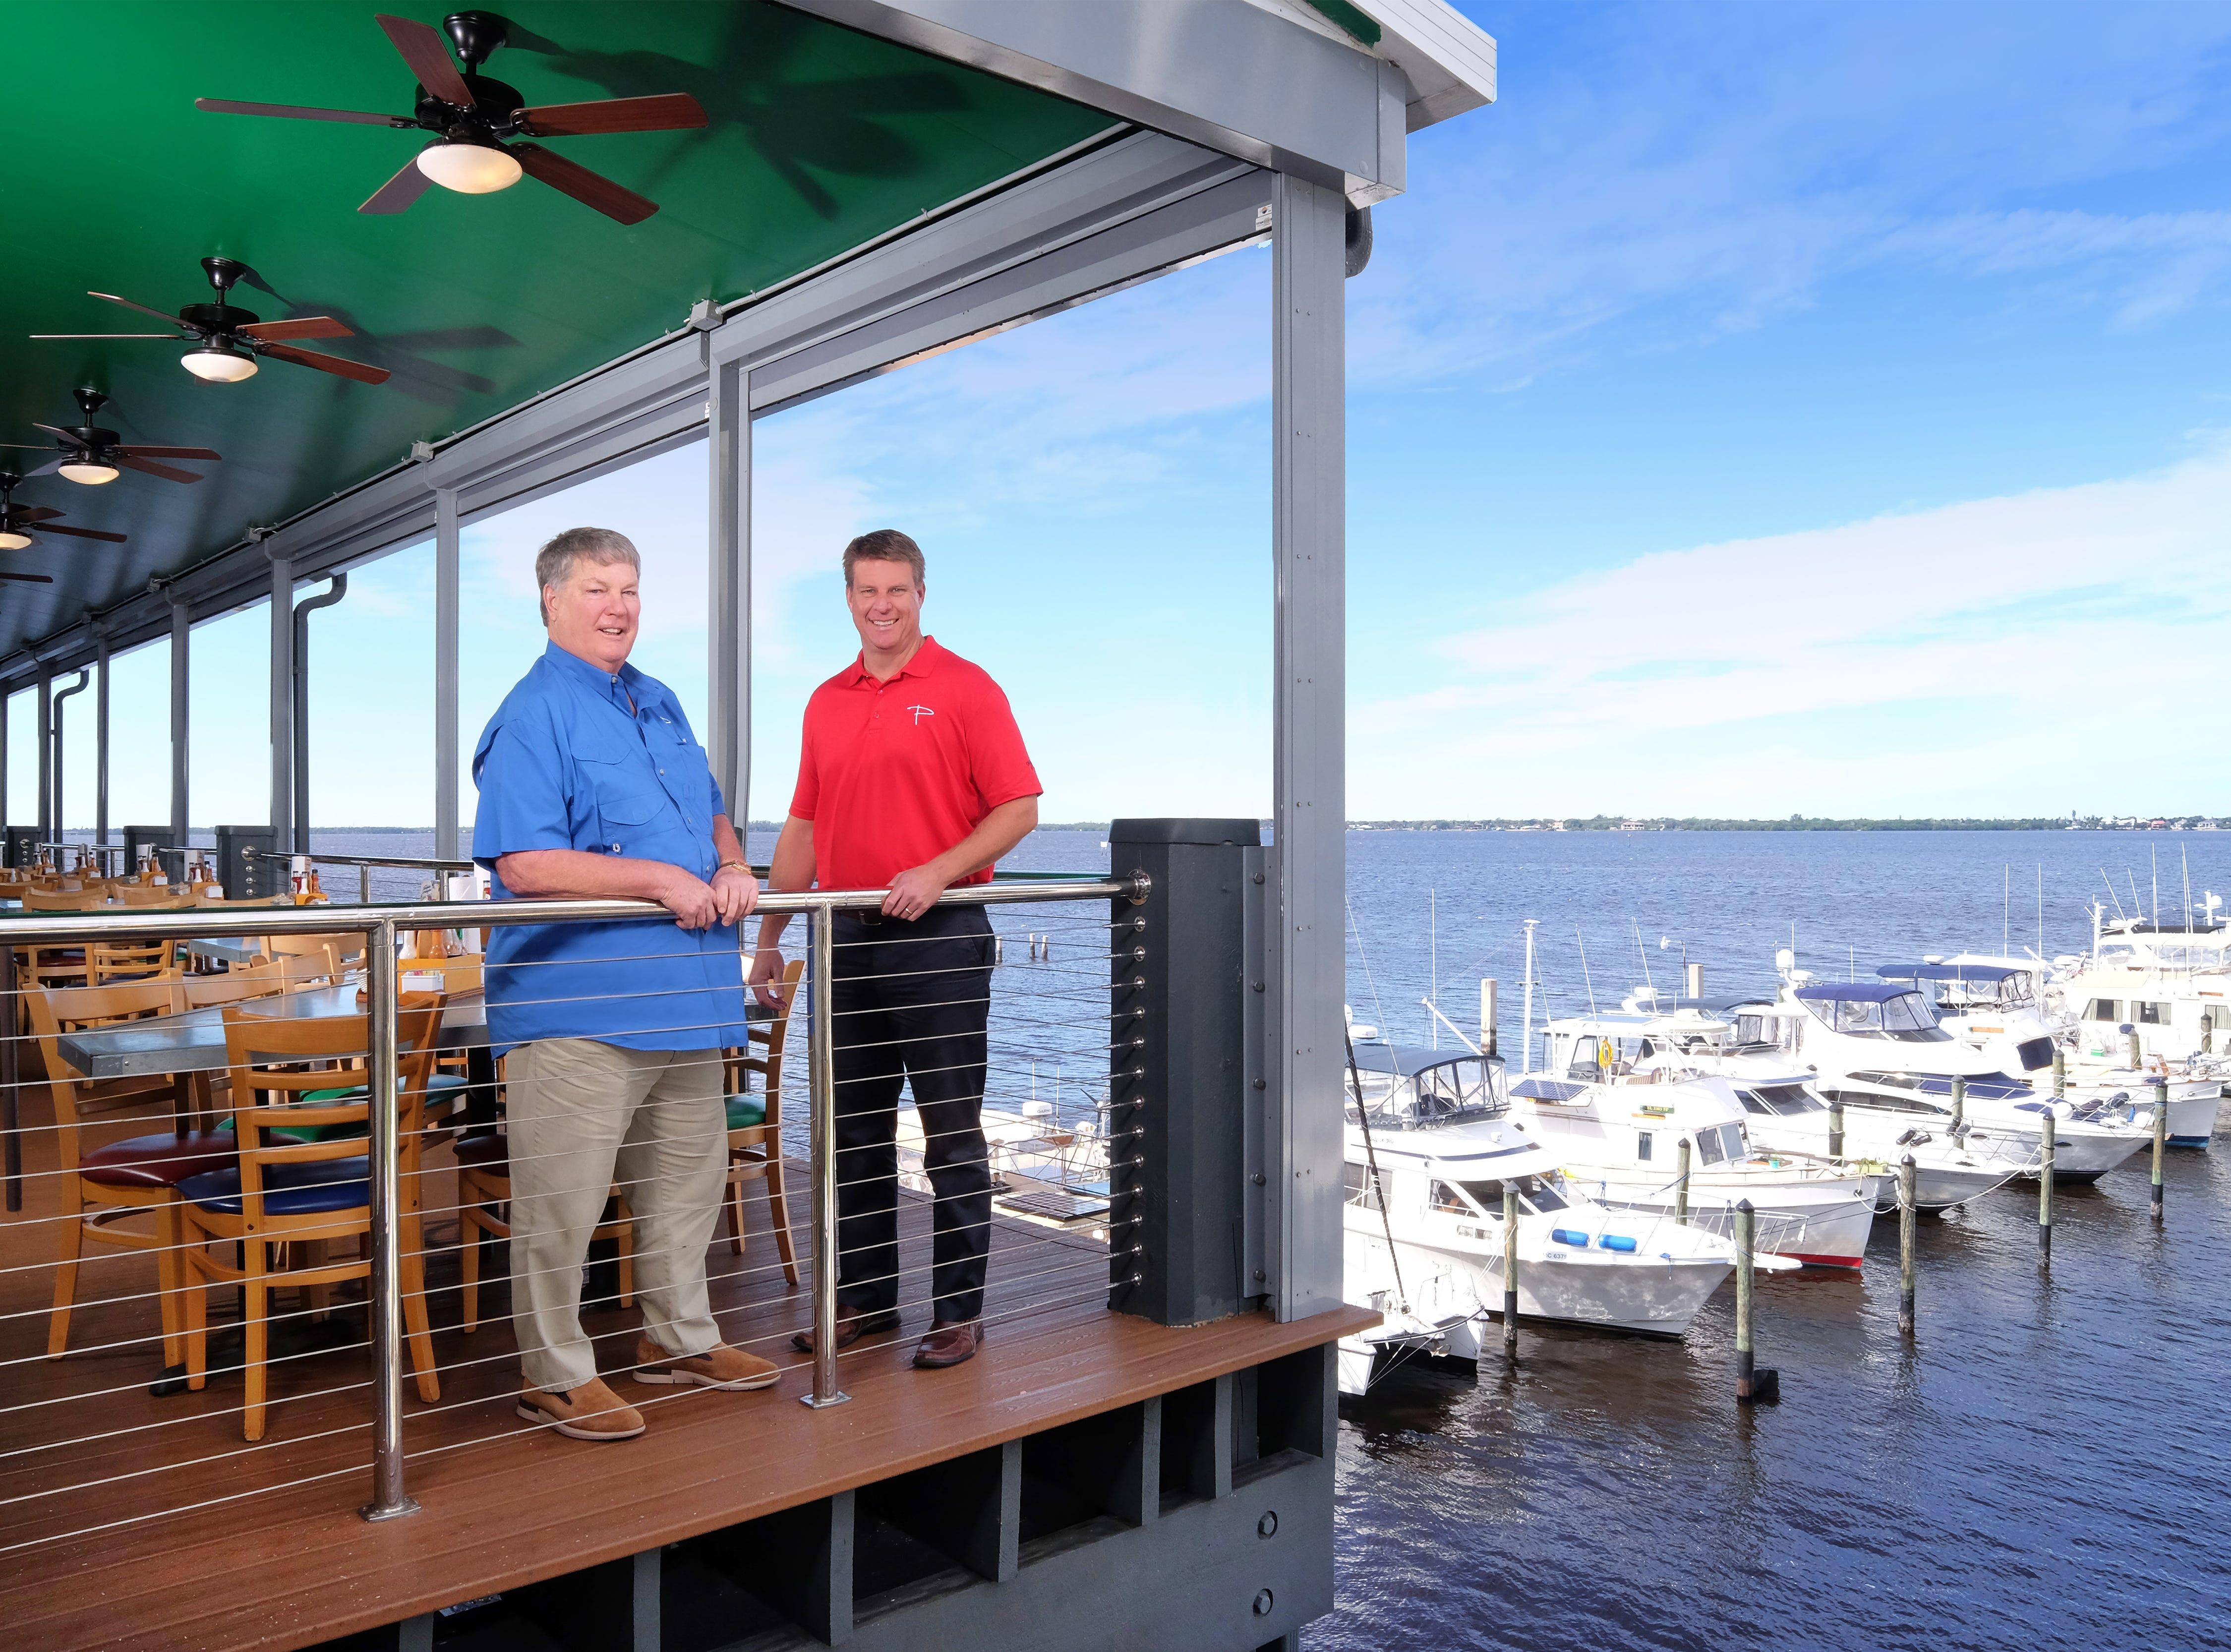 Tony Phelan, left, and his son Grant Phelan own Phelan Family Brands, the company behind Pinchers, Deep Lagoon Seafood and Texas Tony's Rib & Brewhouse.